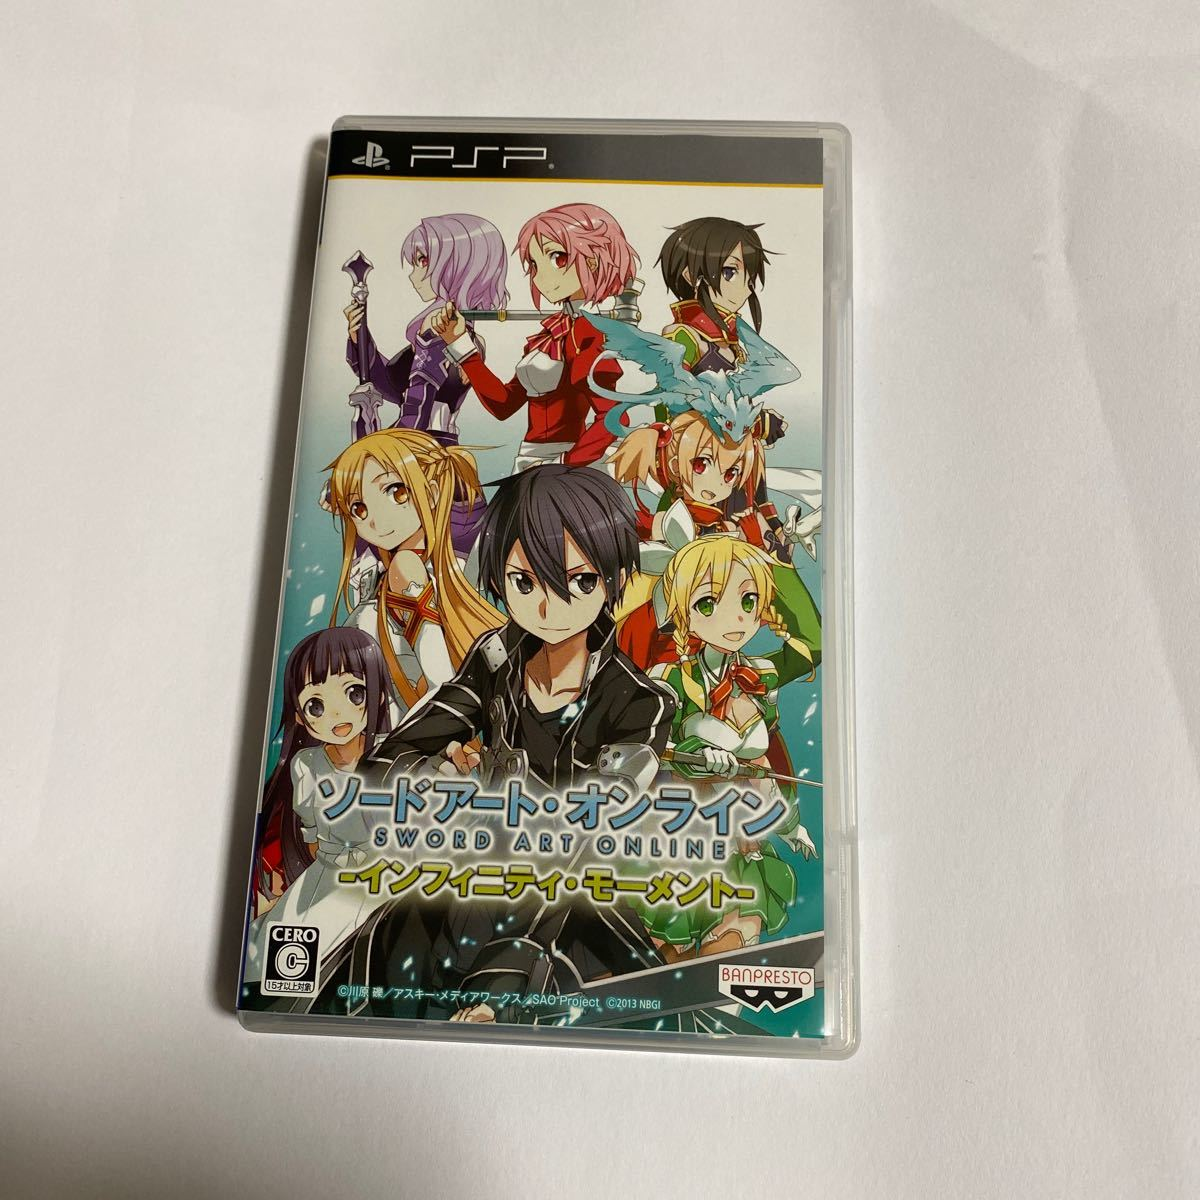 PSPソフト PSP 初回限定 限定版ソードアートオンライン インフィニティモーメント